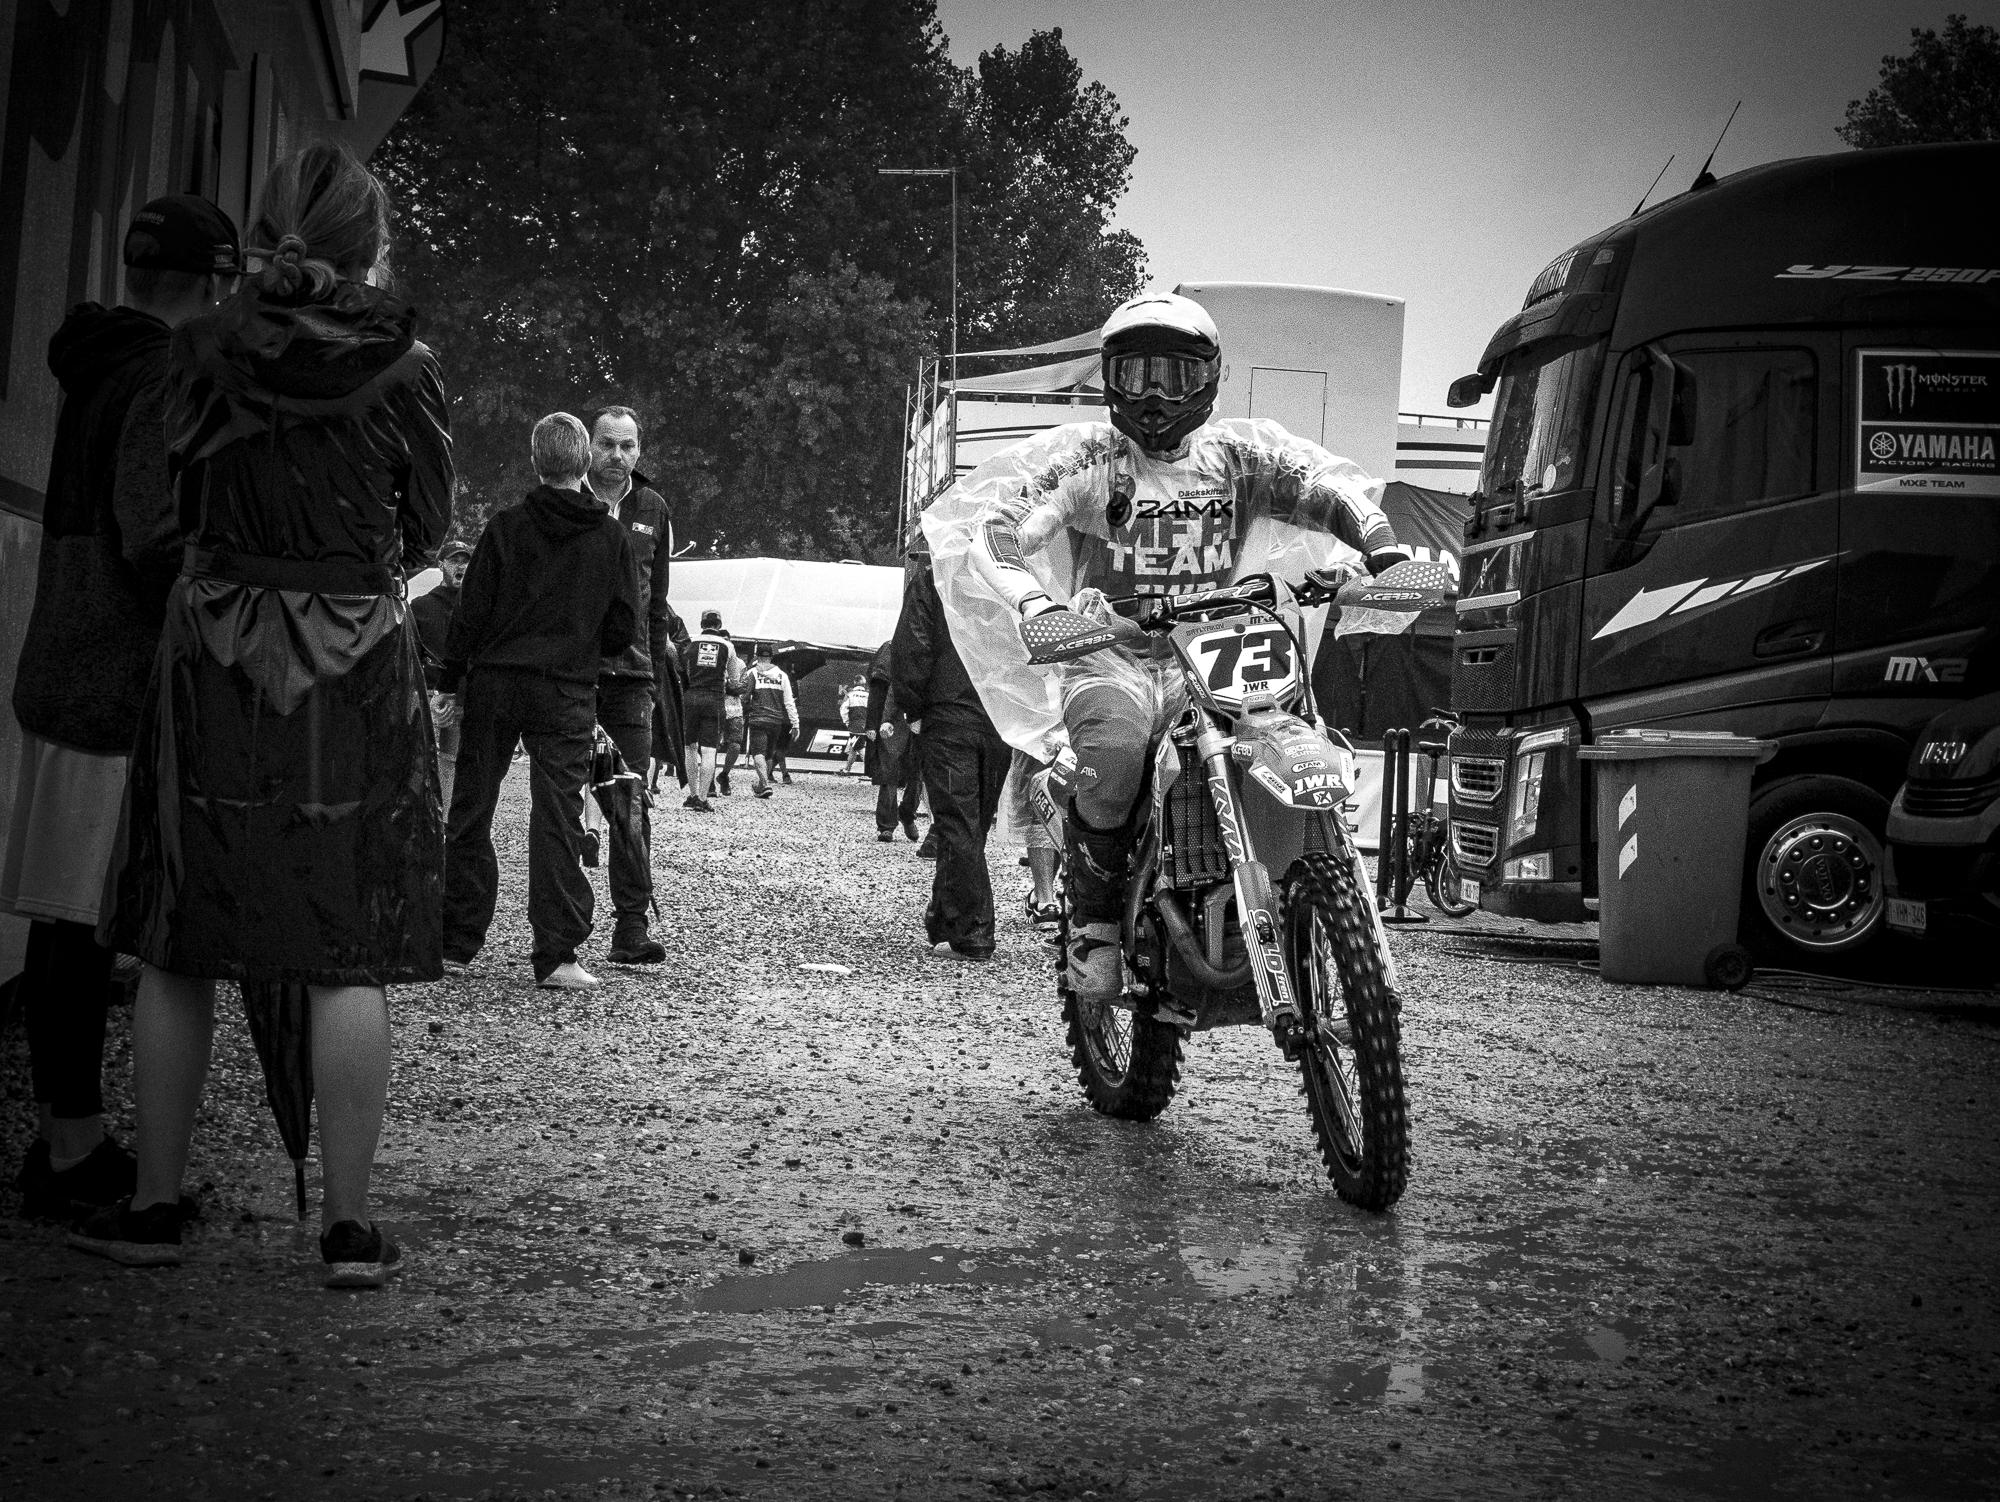 Moto Rider in Rain Pancho